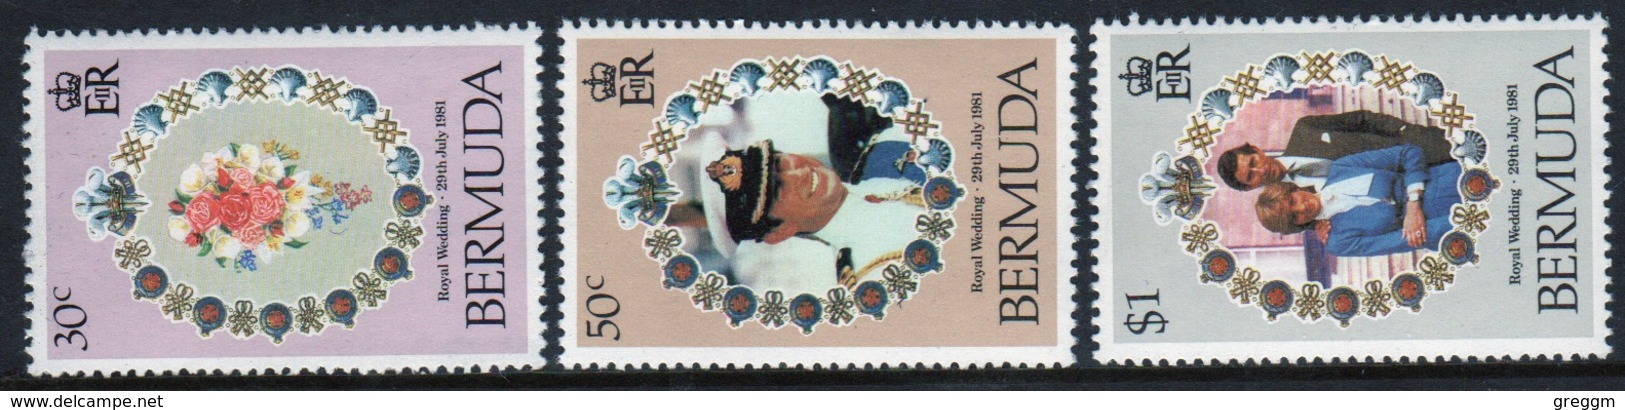 Bermuda Elizabeth II 1981 Set Of Stamps To Celebrate Royal Wedding. - Bermuda